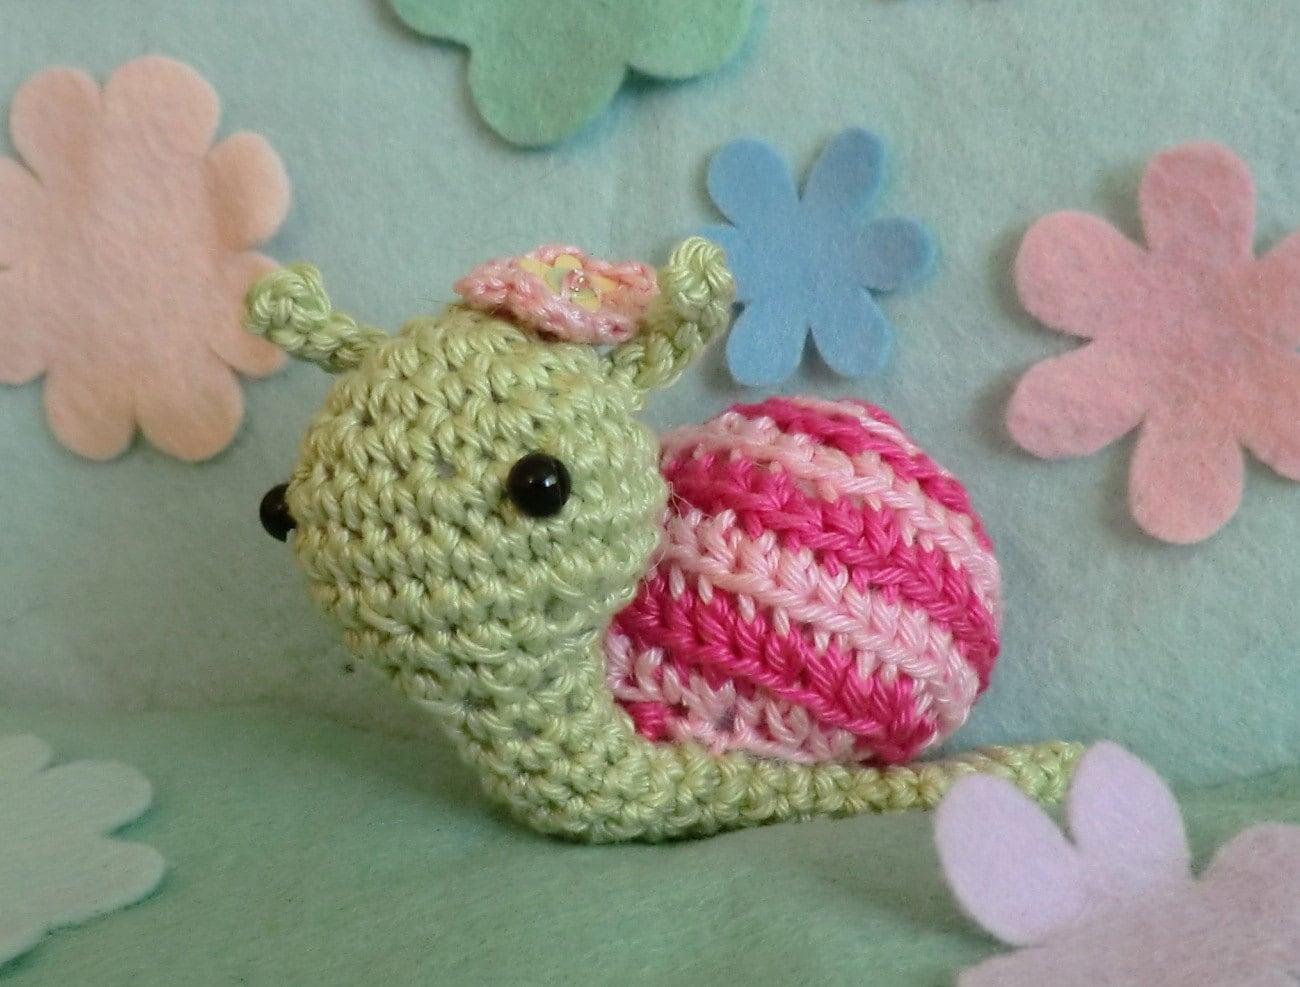 Amigurumi Free Pattern Snail : Jane the snail crochet amigurumi pattern PDF by AmigurumiBarmy